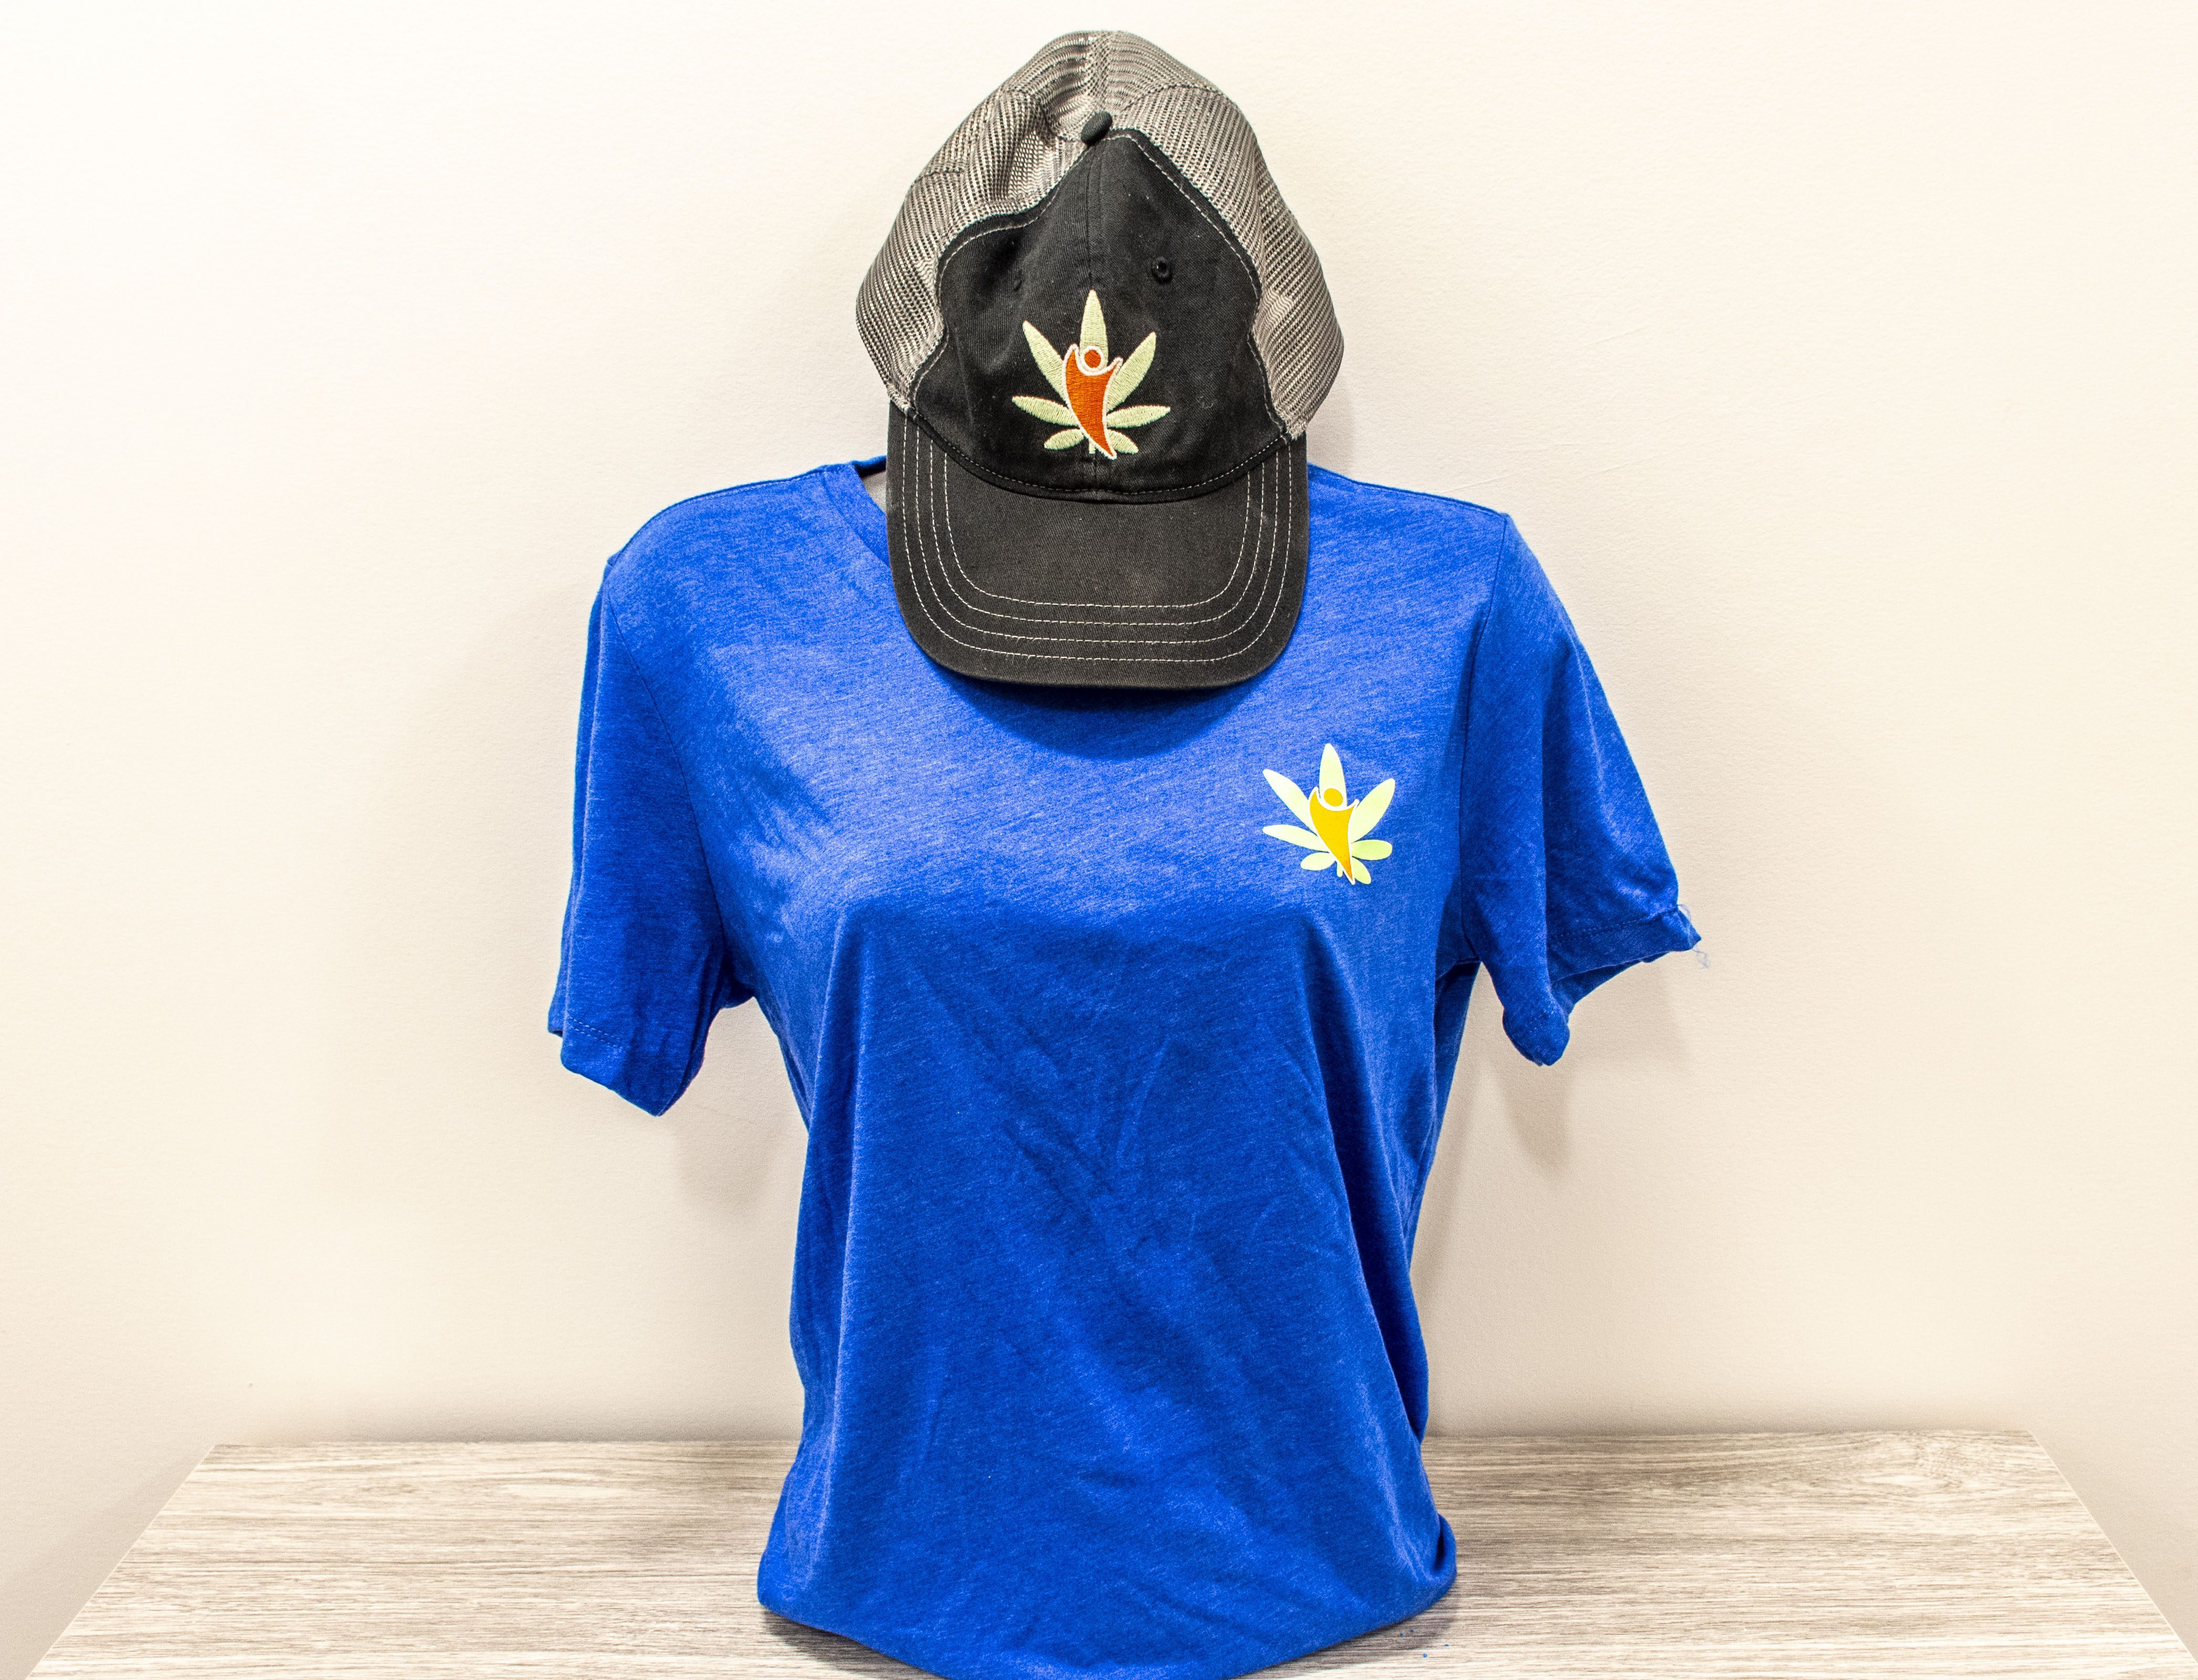 lady blue shirt